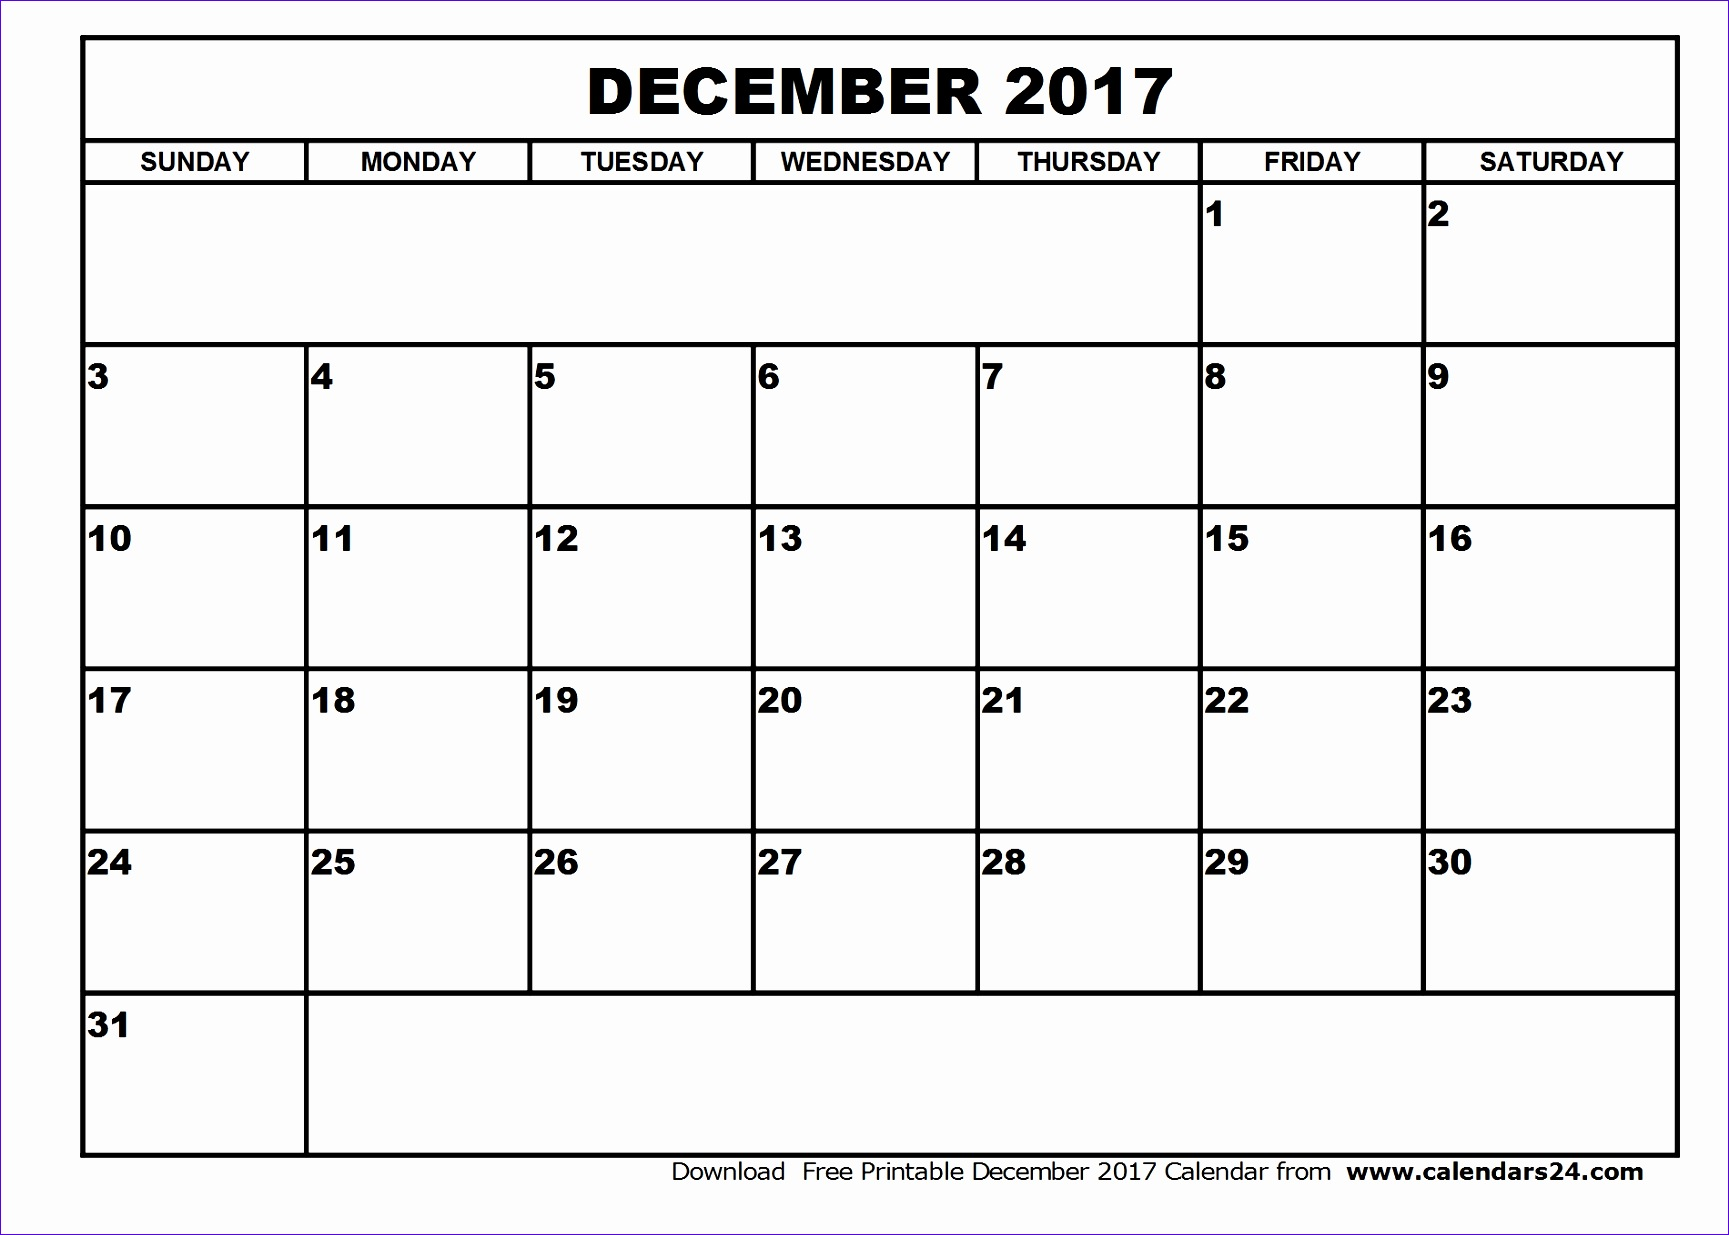 december 2017 calendar 988 17291235